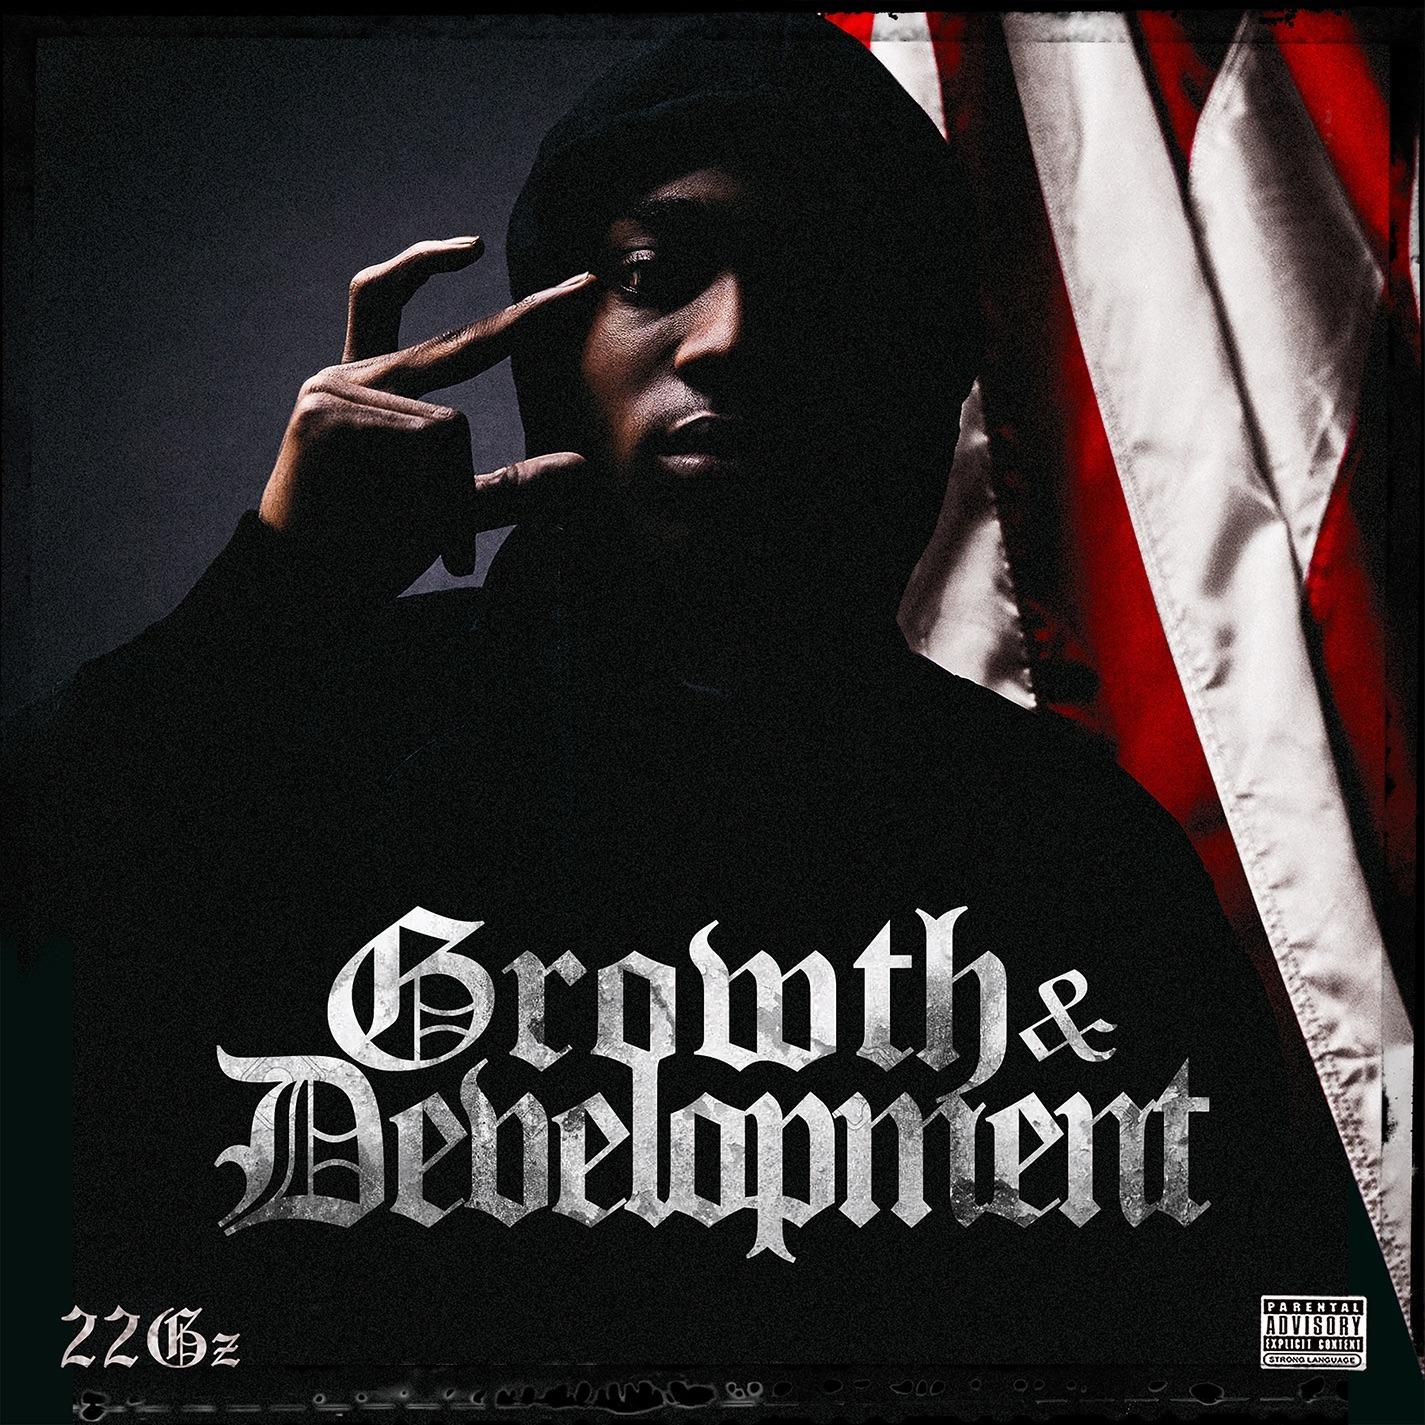 22Gz - Growth & Development